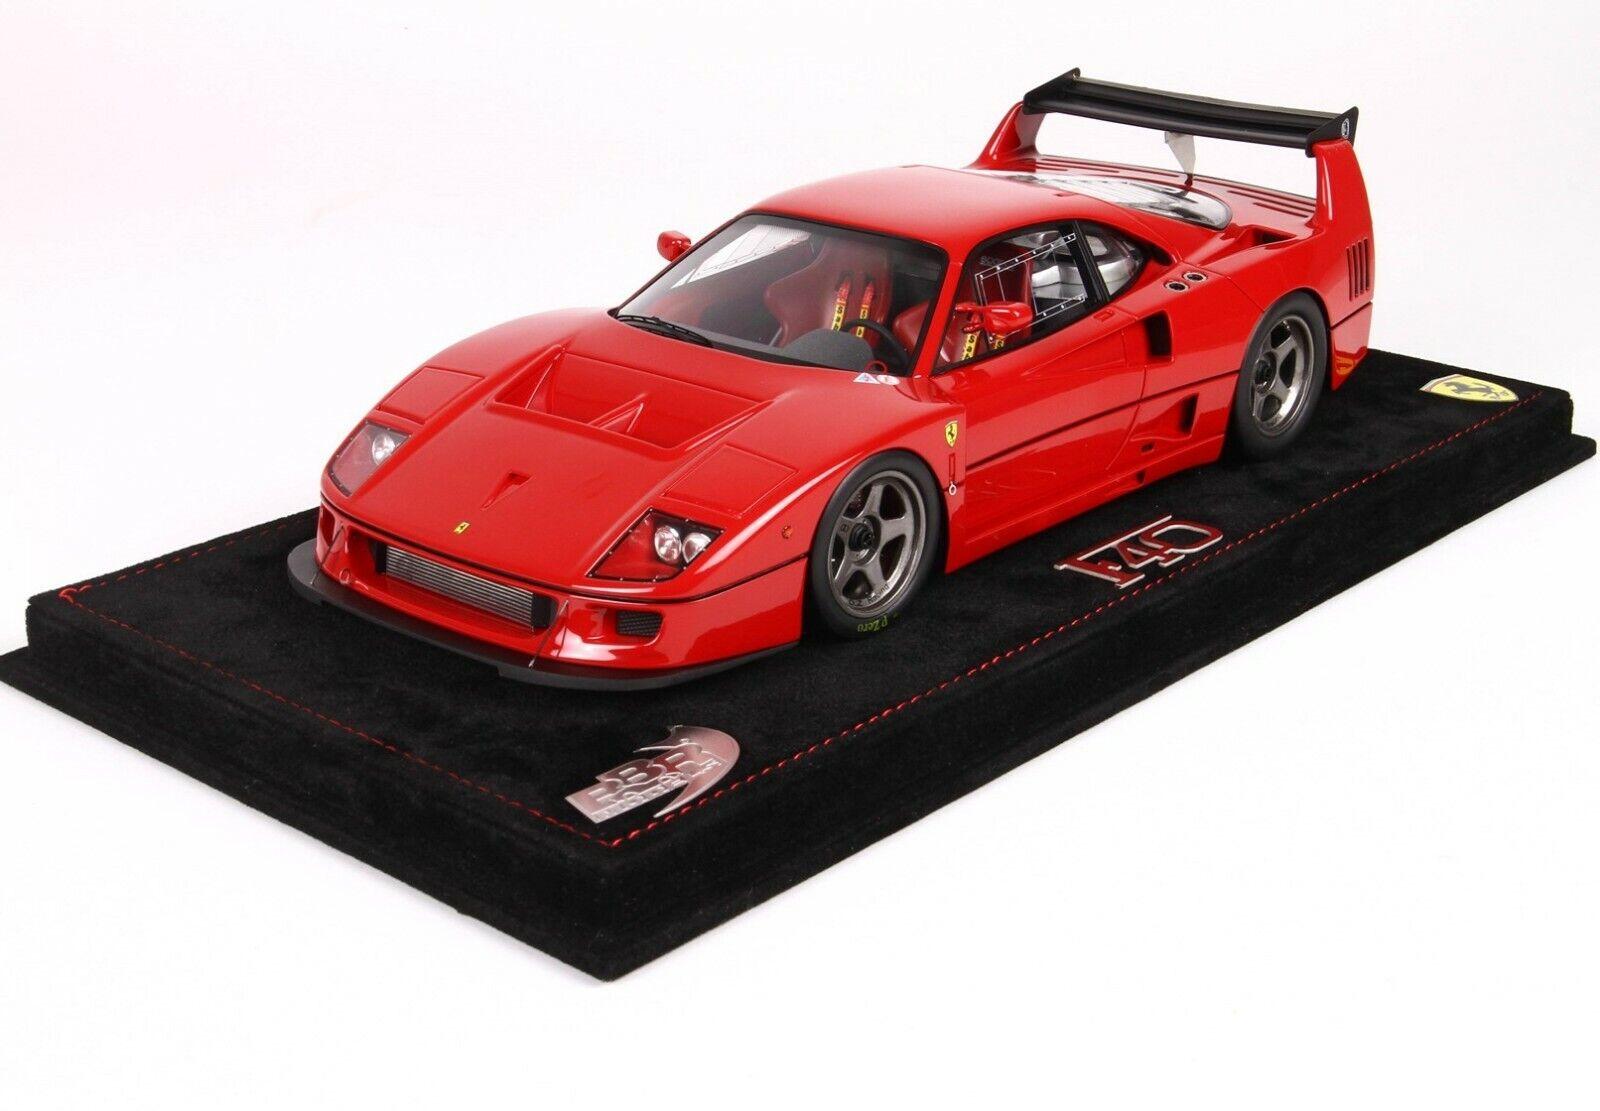 Ferrari F40 Lm en Rojo Coche de Modelo en 1 18 Escala de Bbr